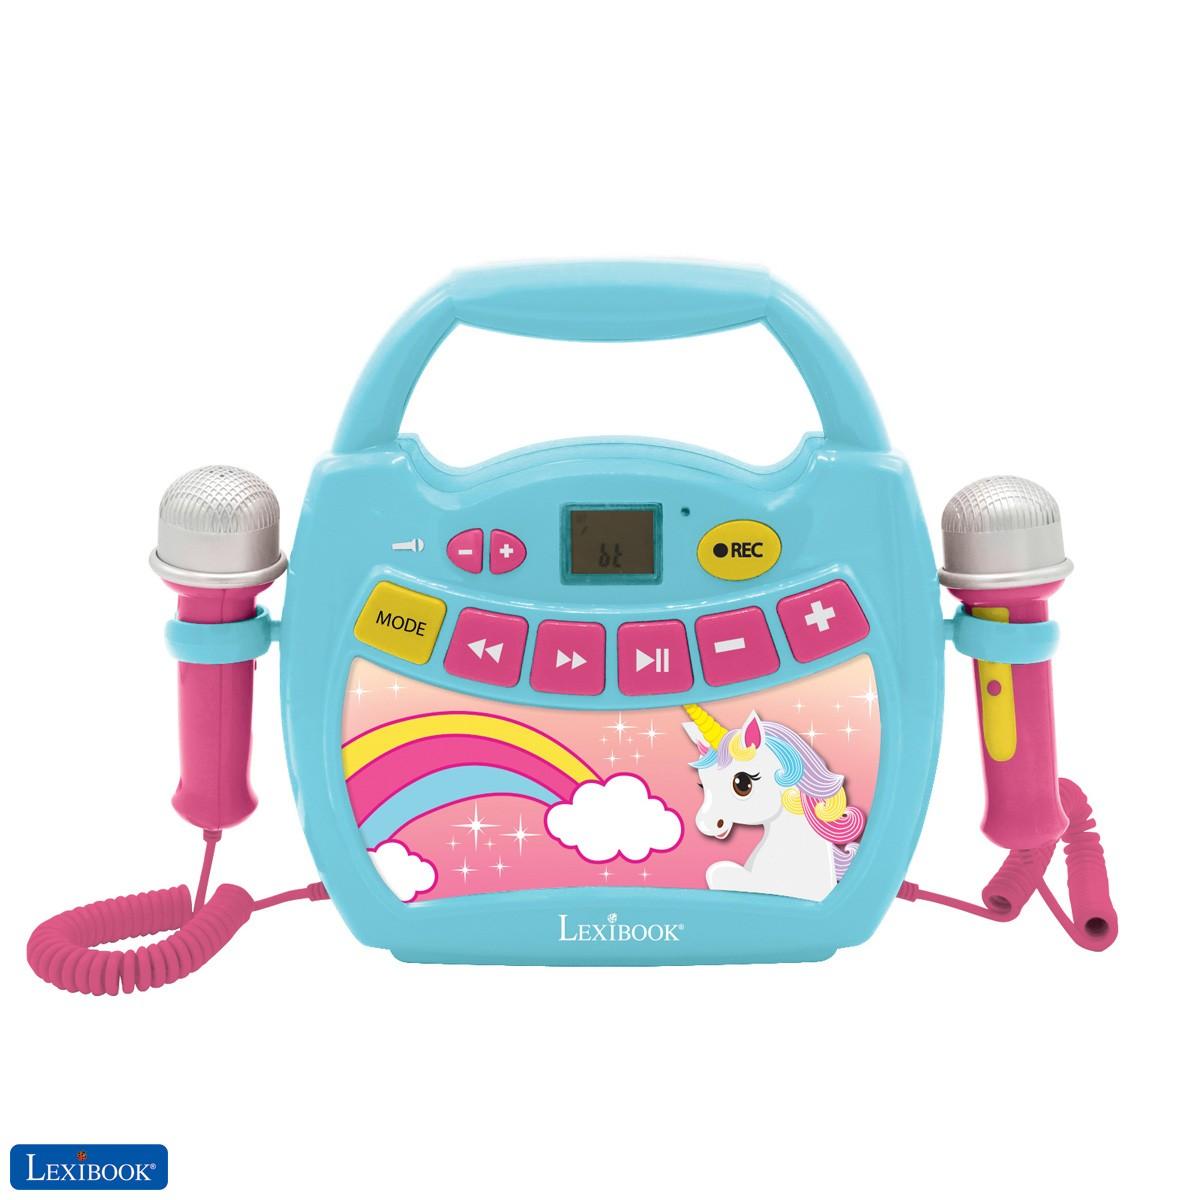 Unicorn, My first digital player karaoke with 2 toy mics